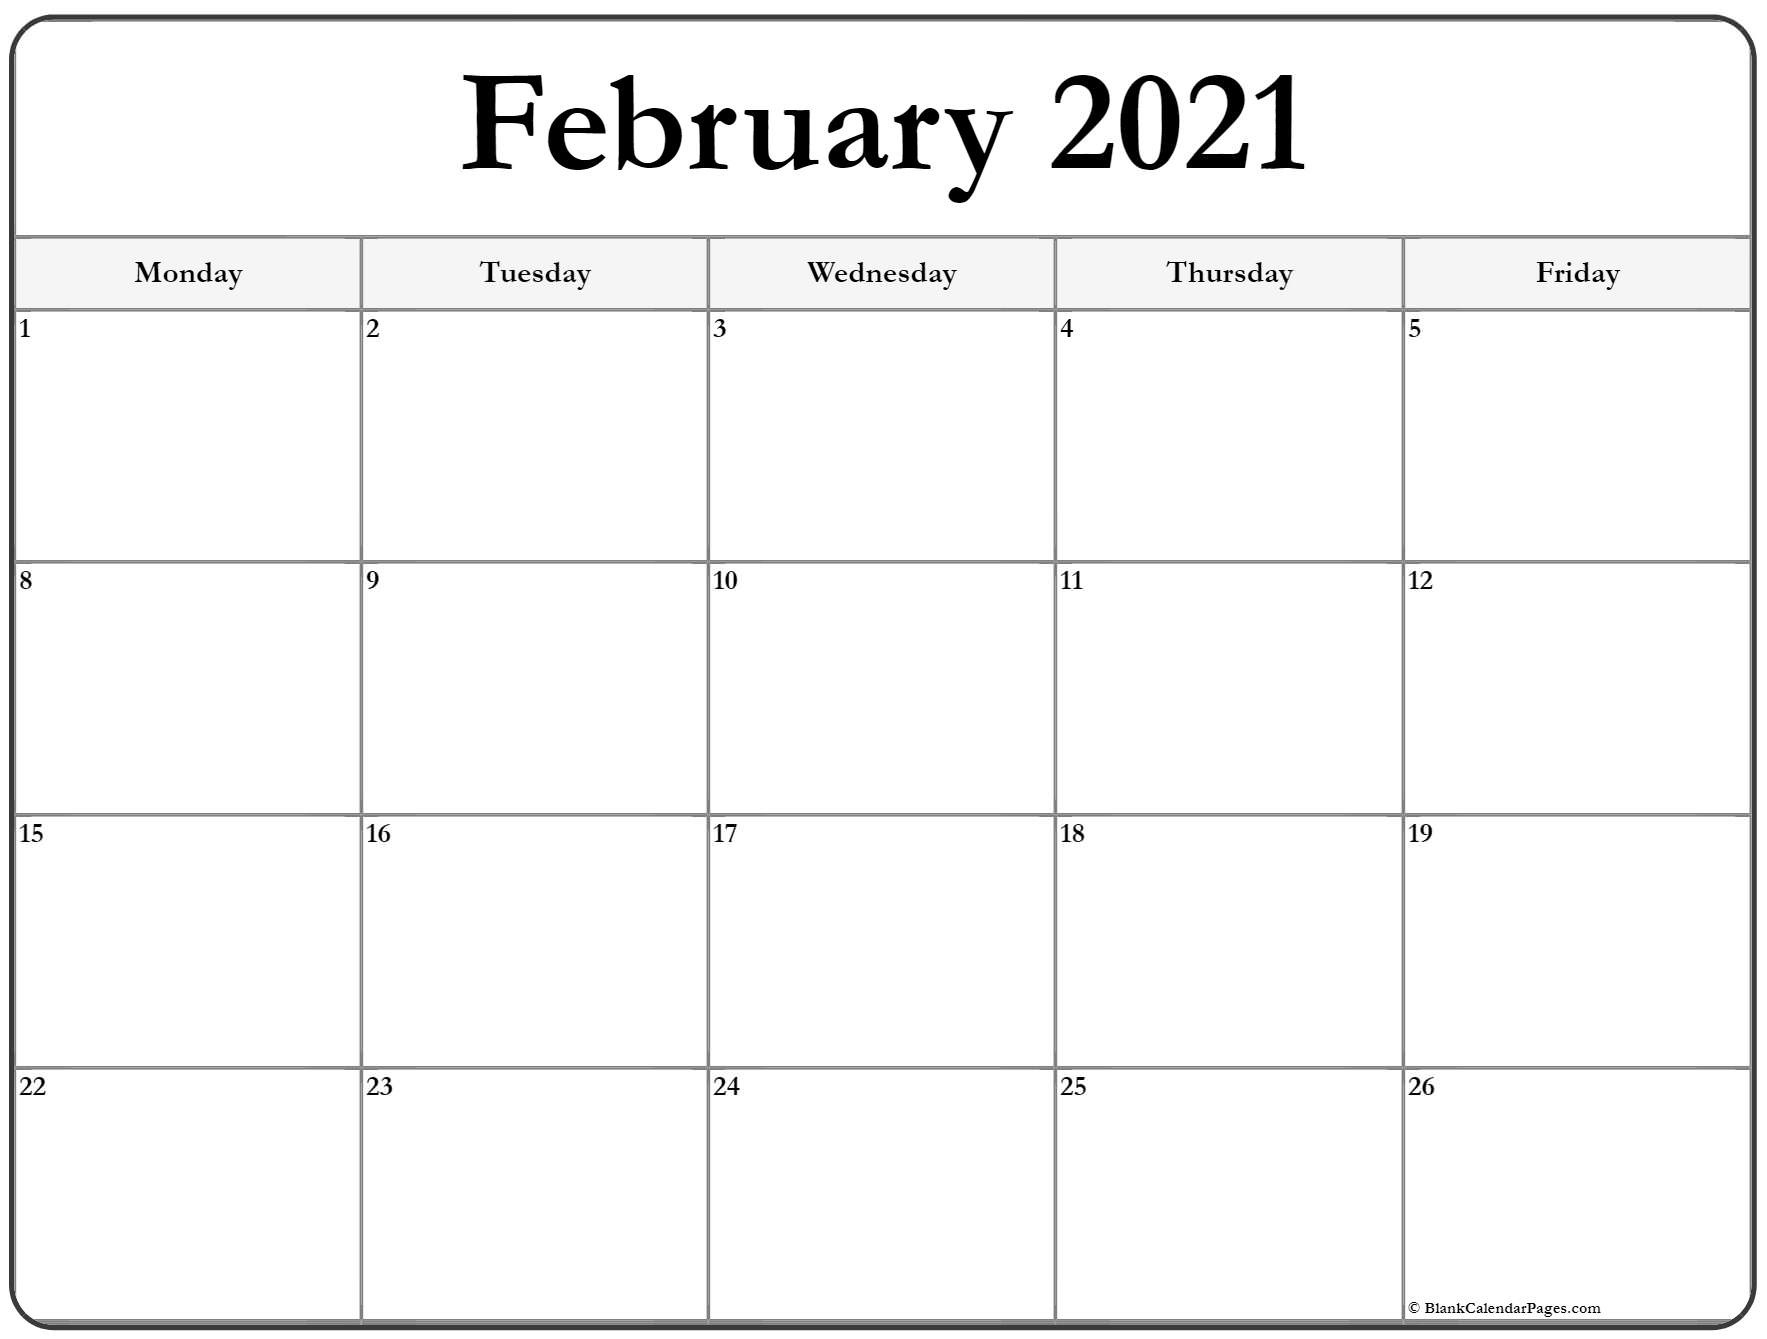 February 2021 Monday Calendar | Monday To Sunday-2021 Calendar That Shows Only Monday Through Friday